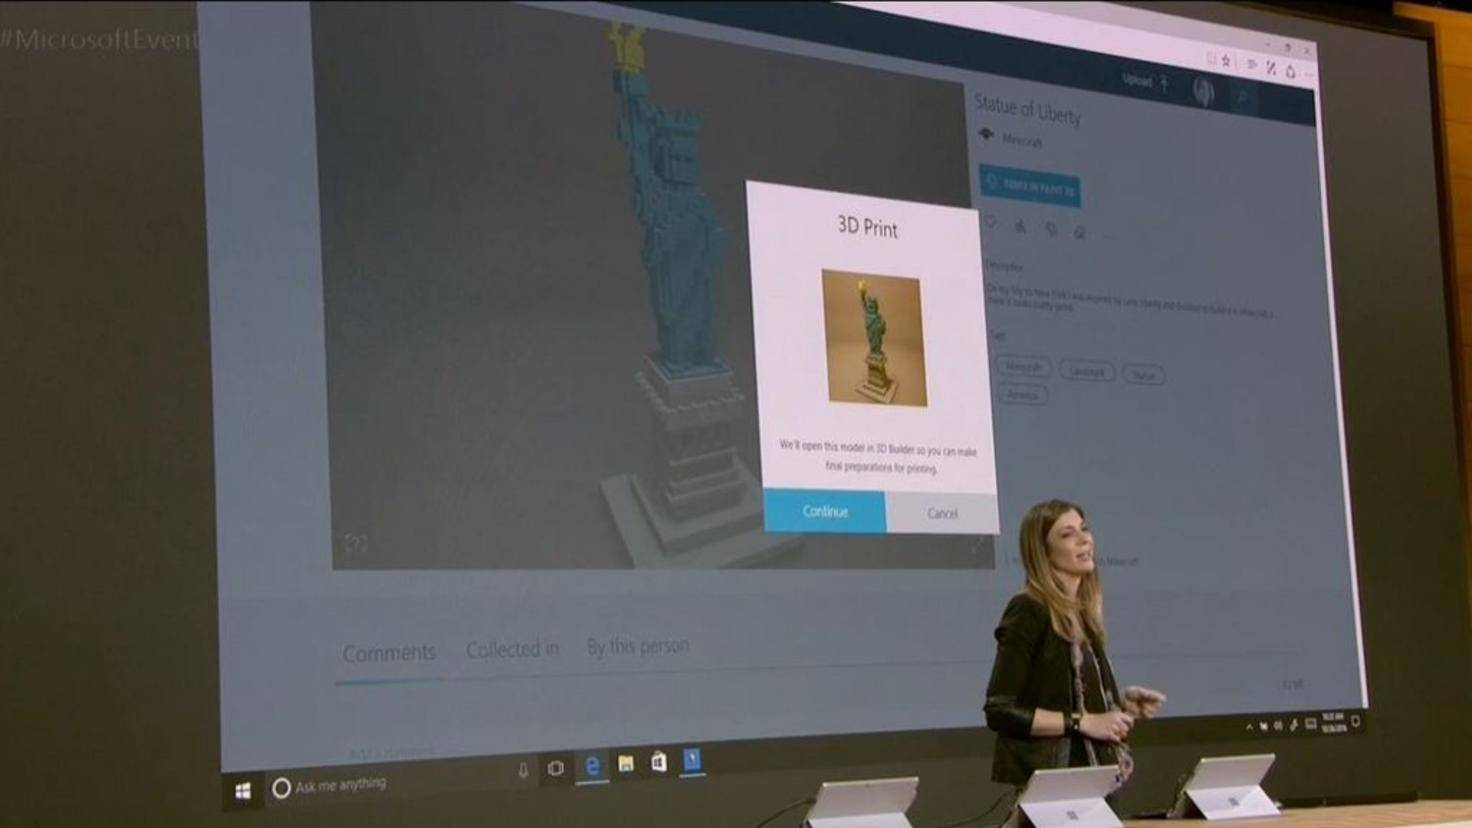 Windows 10 Drucker 3D